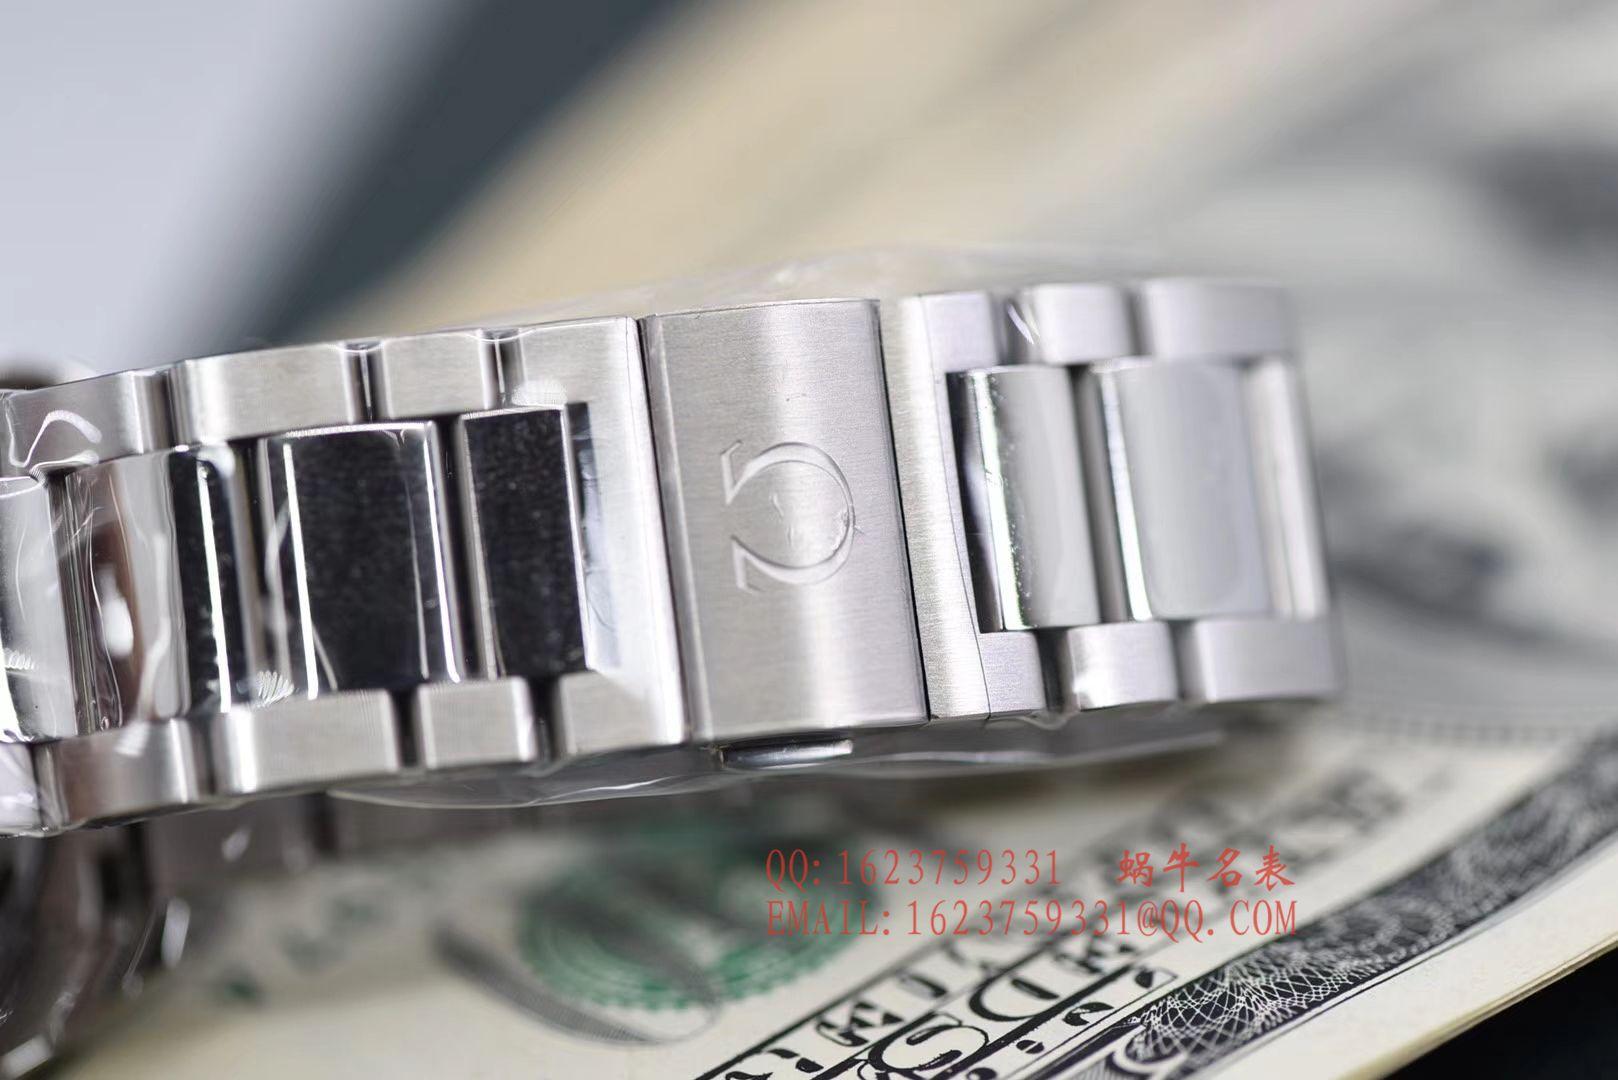 【KW厂一比一复刻手表】欧米茄海马系列231.13.42.21.02.003腕表 / M229